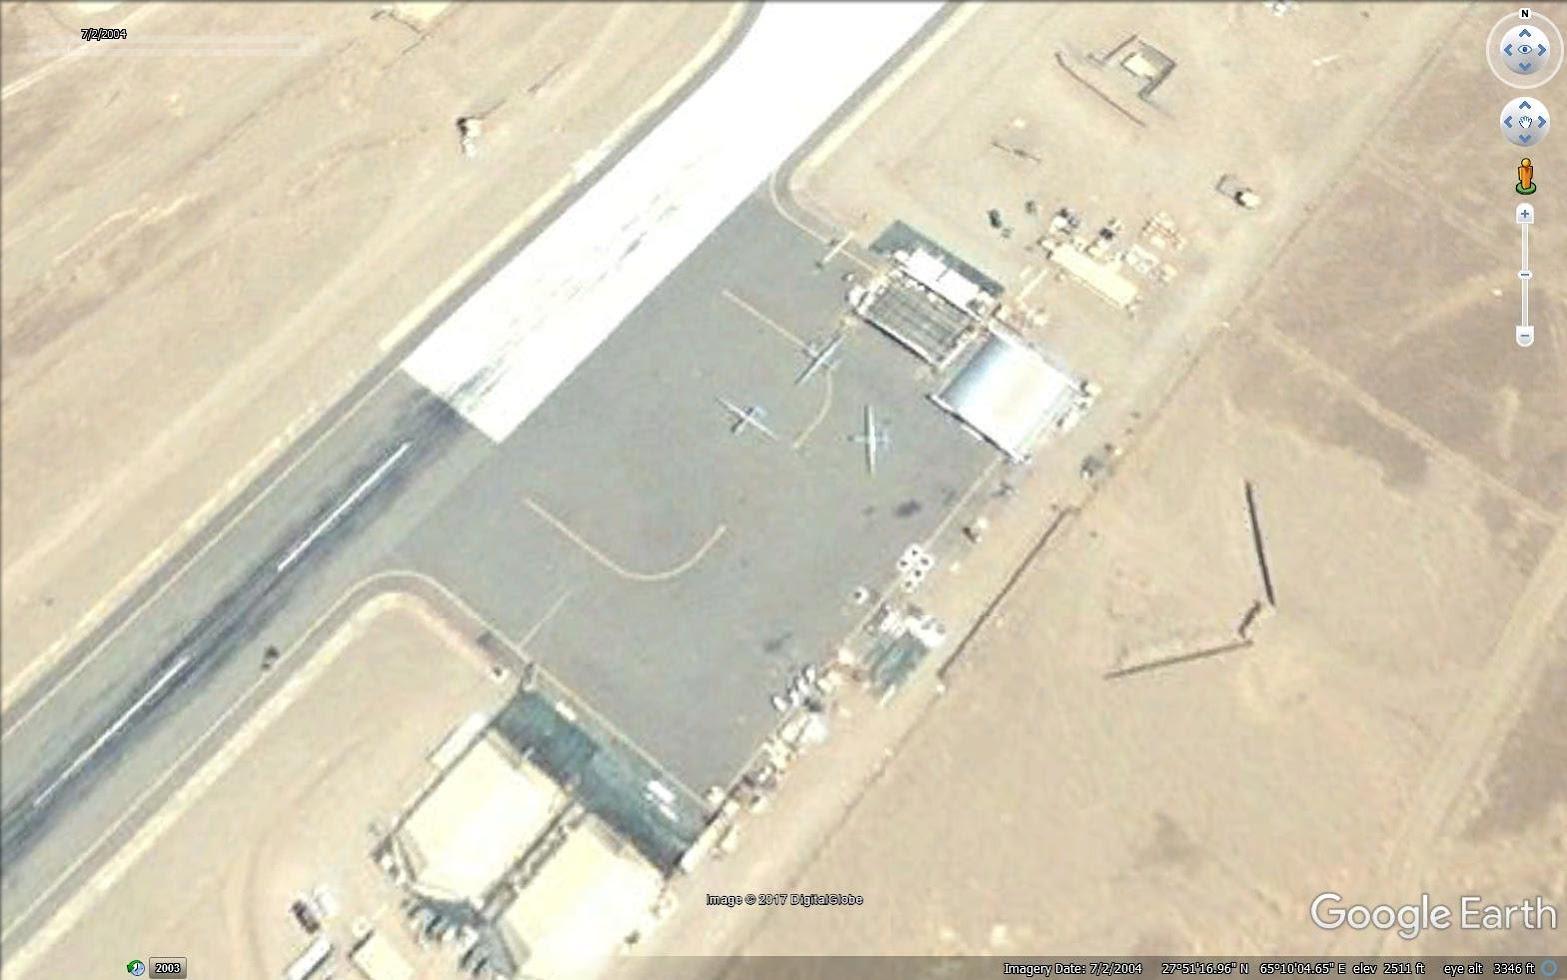 3 American Predator drones in 2004